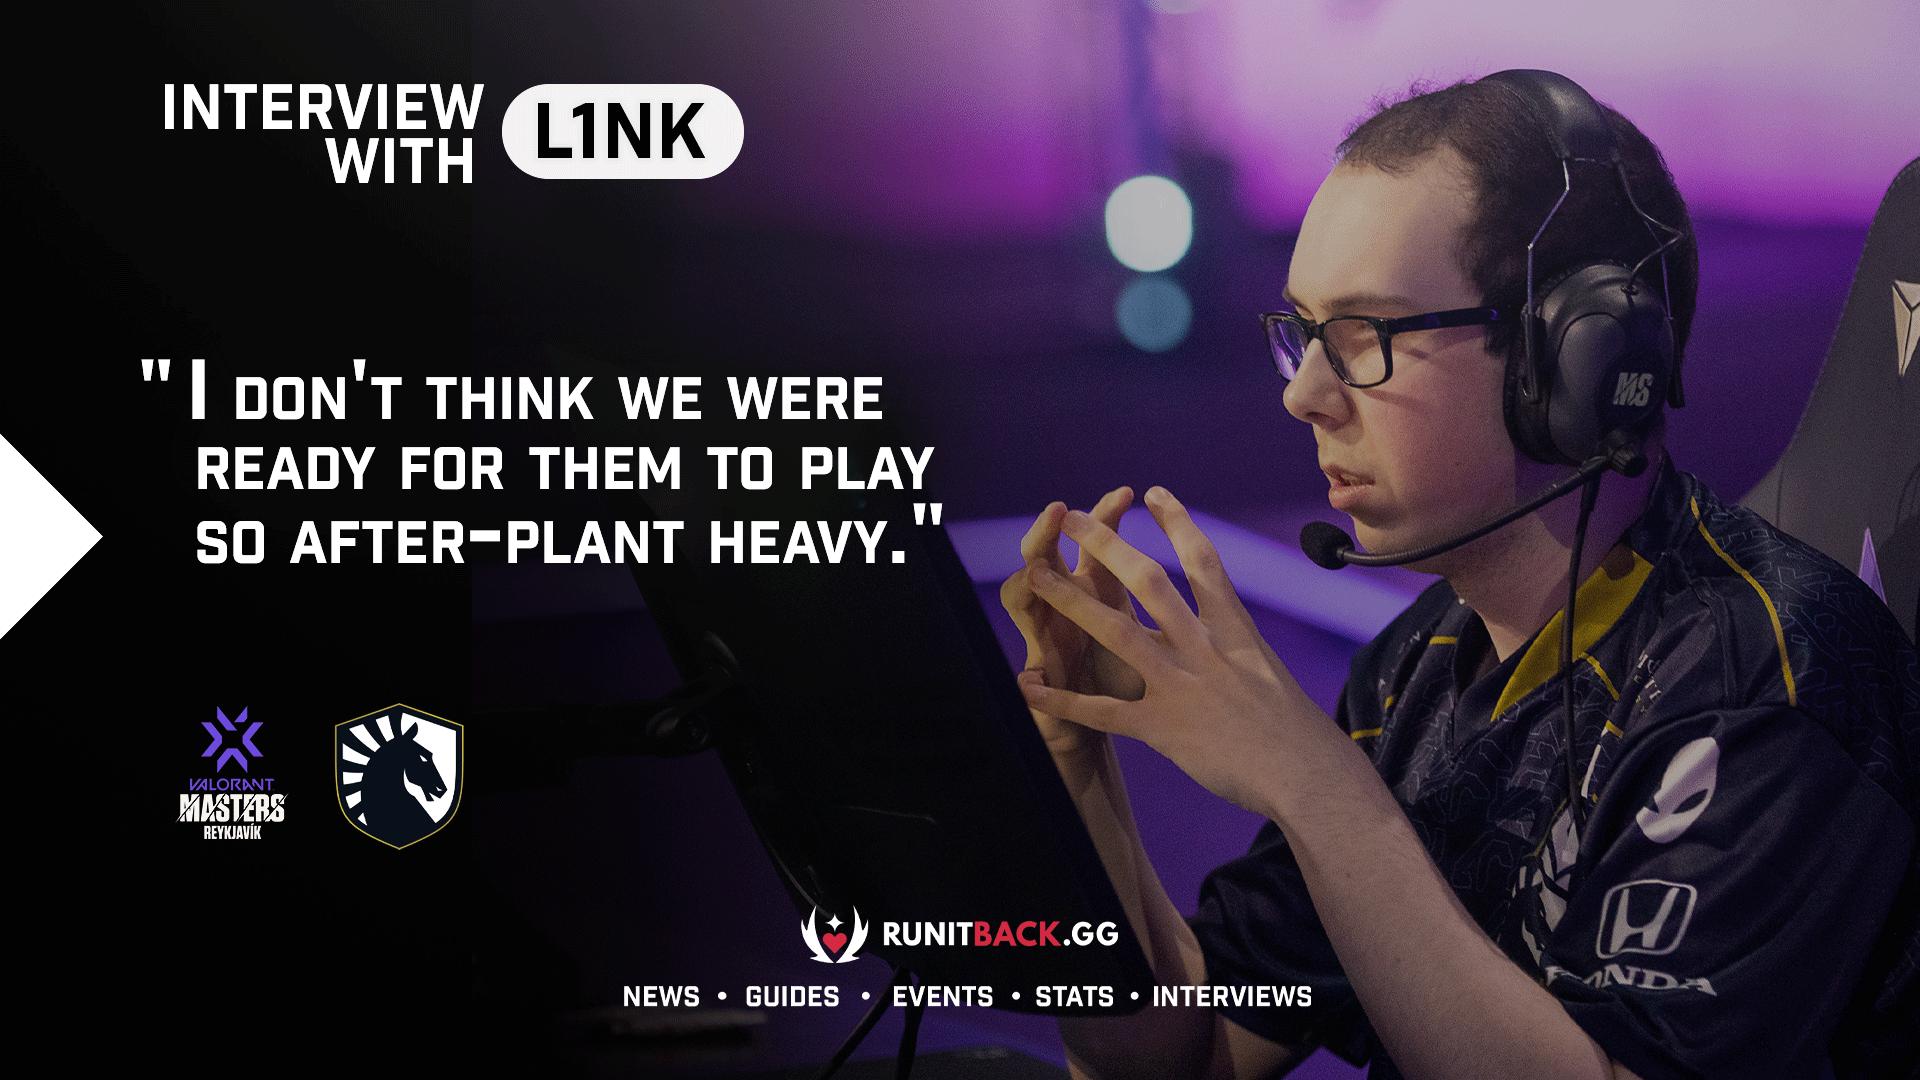 L1NK discusses how Version1's heavy post-plant play surprised Team Liquid